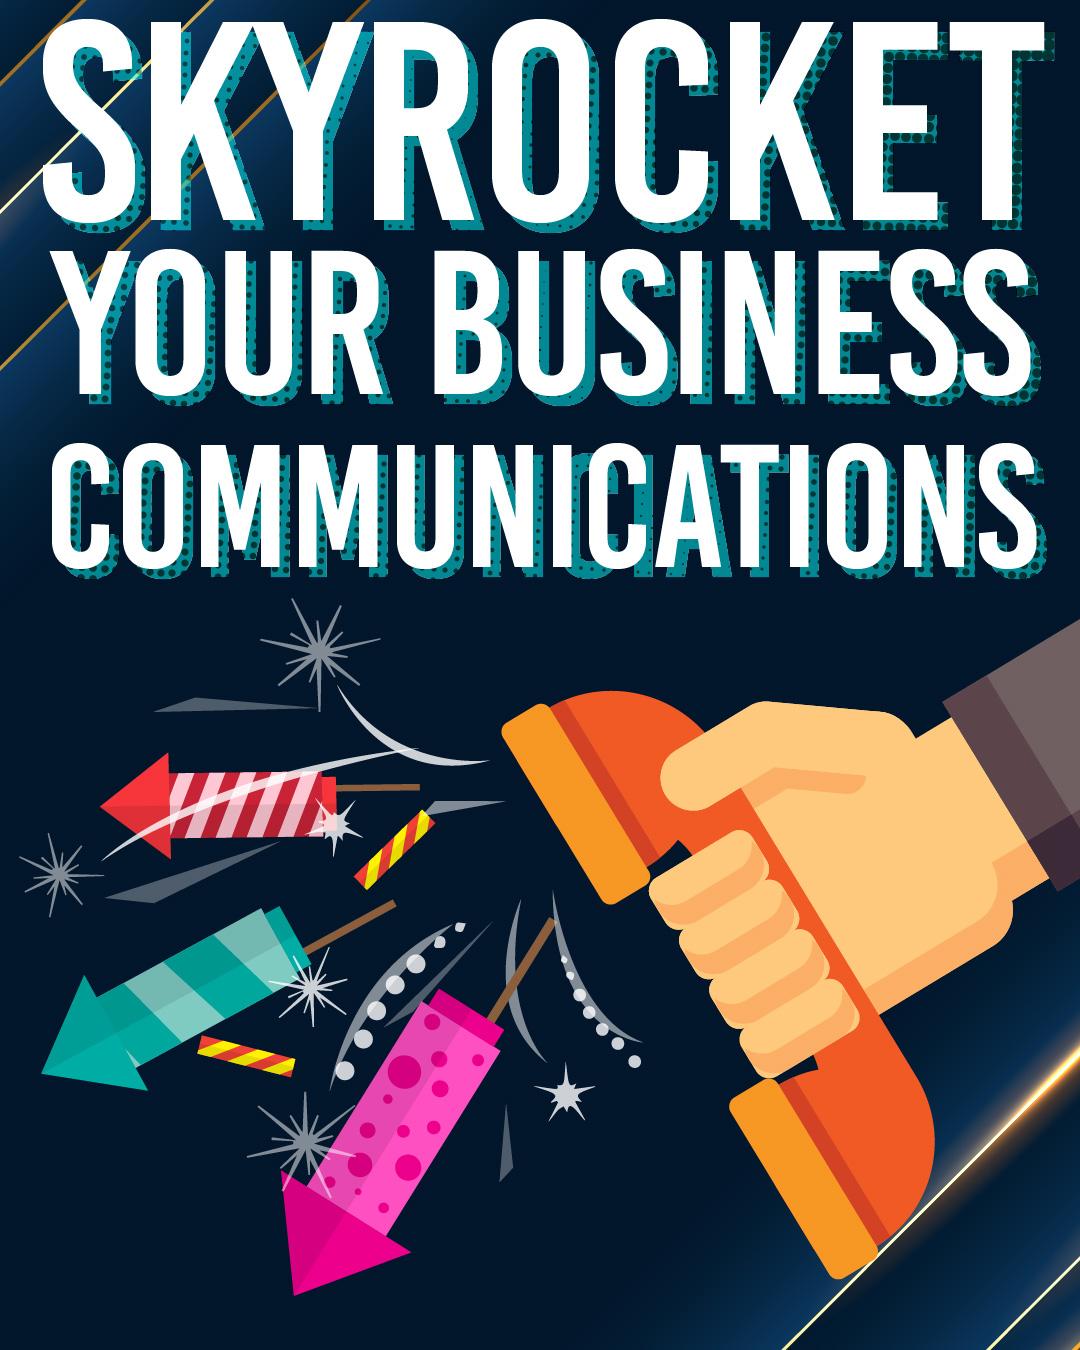 Bonfire Night 2020: Skyrocket Your Business Communications